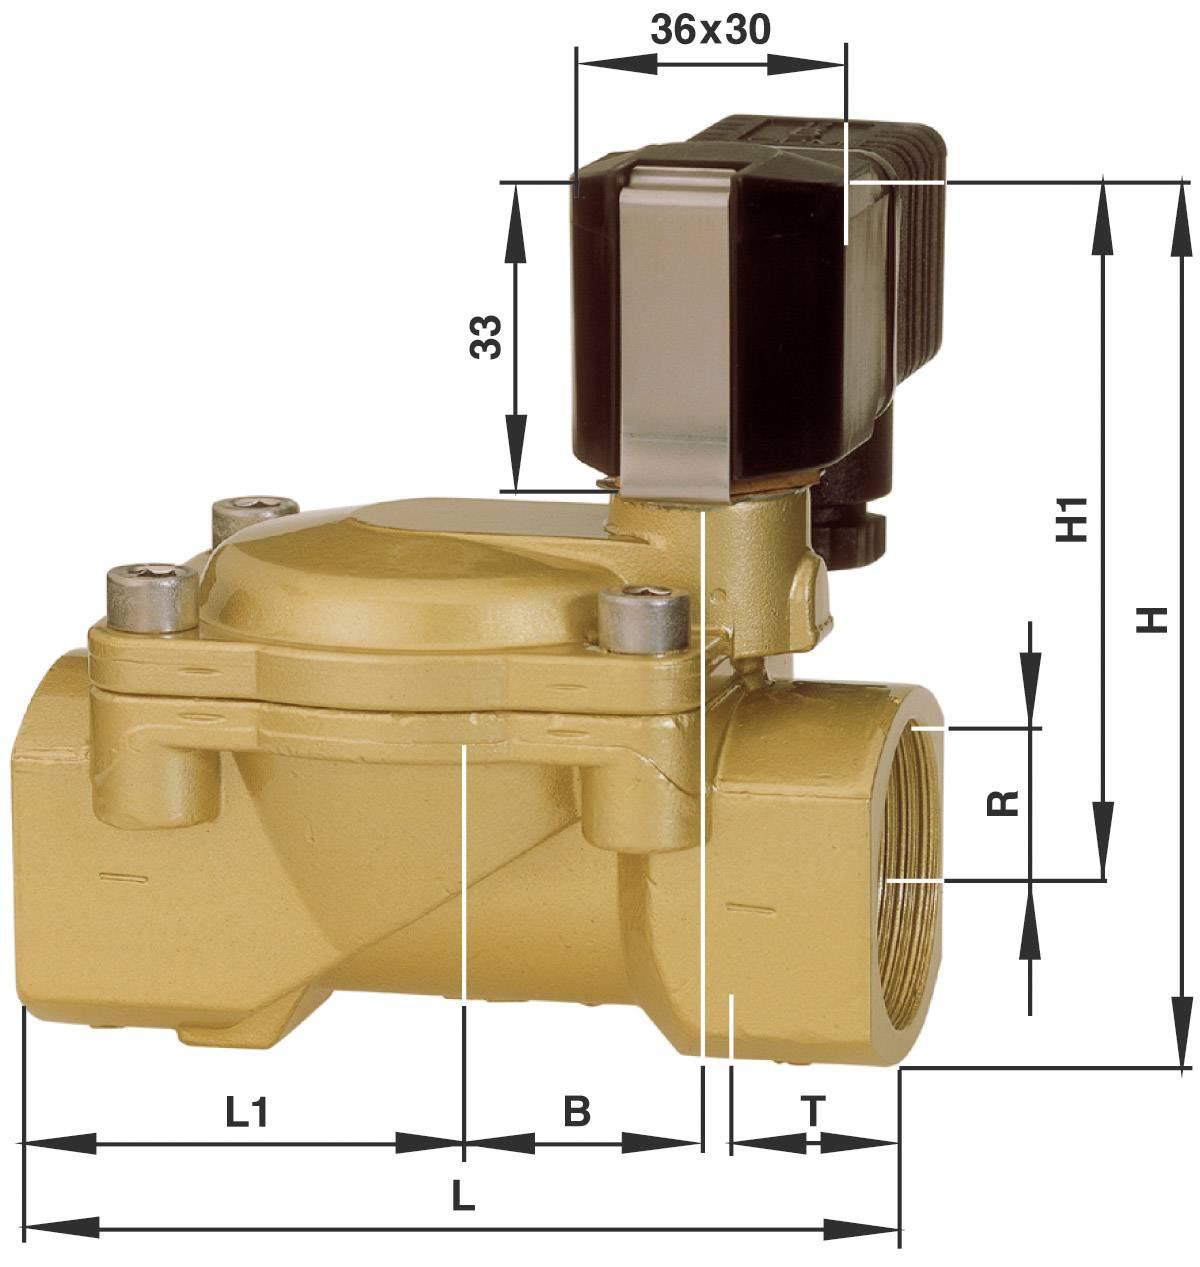 2/2-cestný mechanicky odolný ventil pneumatiky Busch Jost 8240300.9101.02400, G 3/4, 24 V/DC